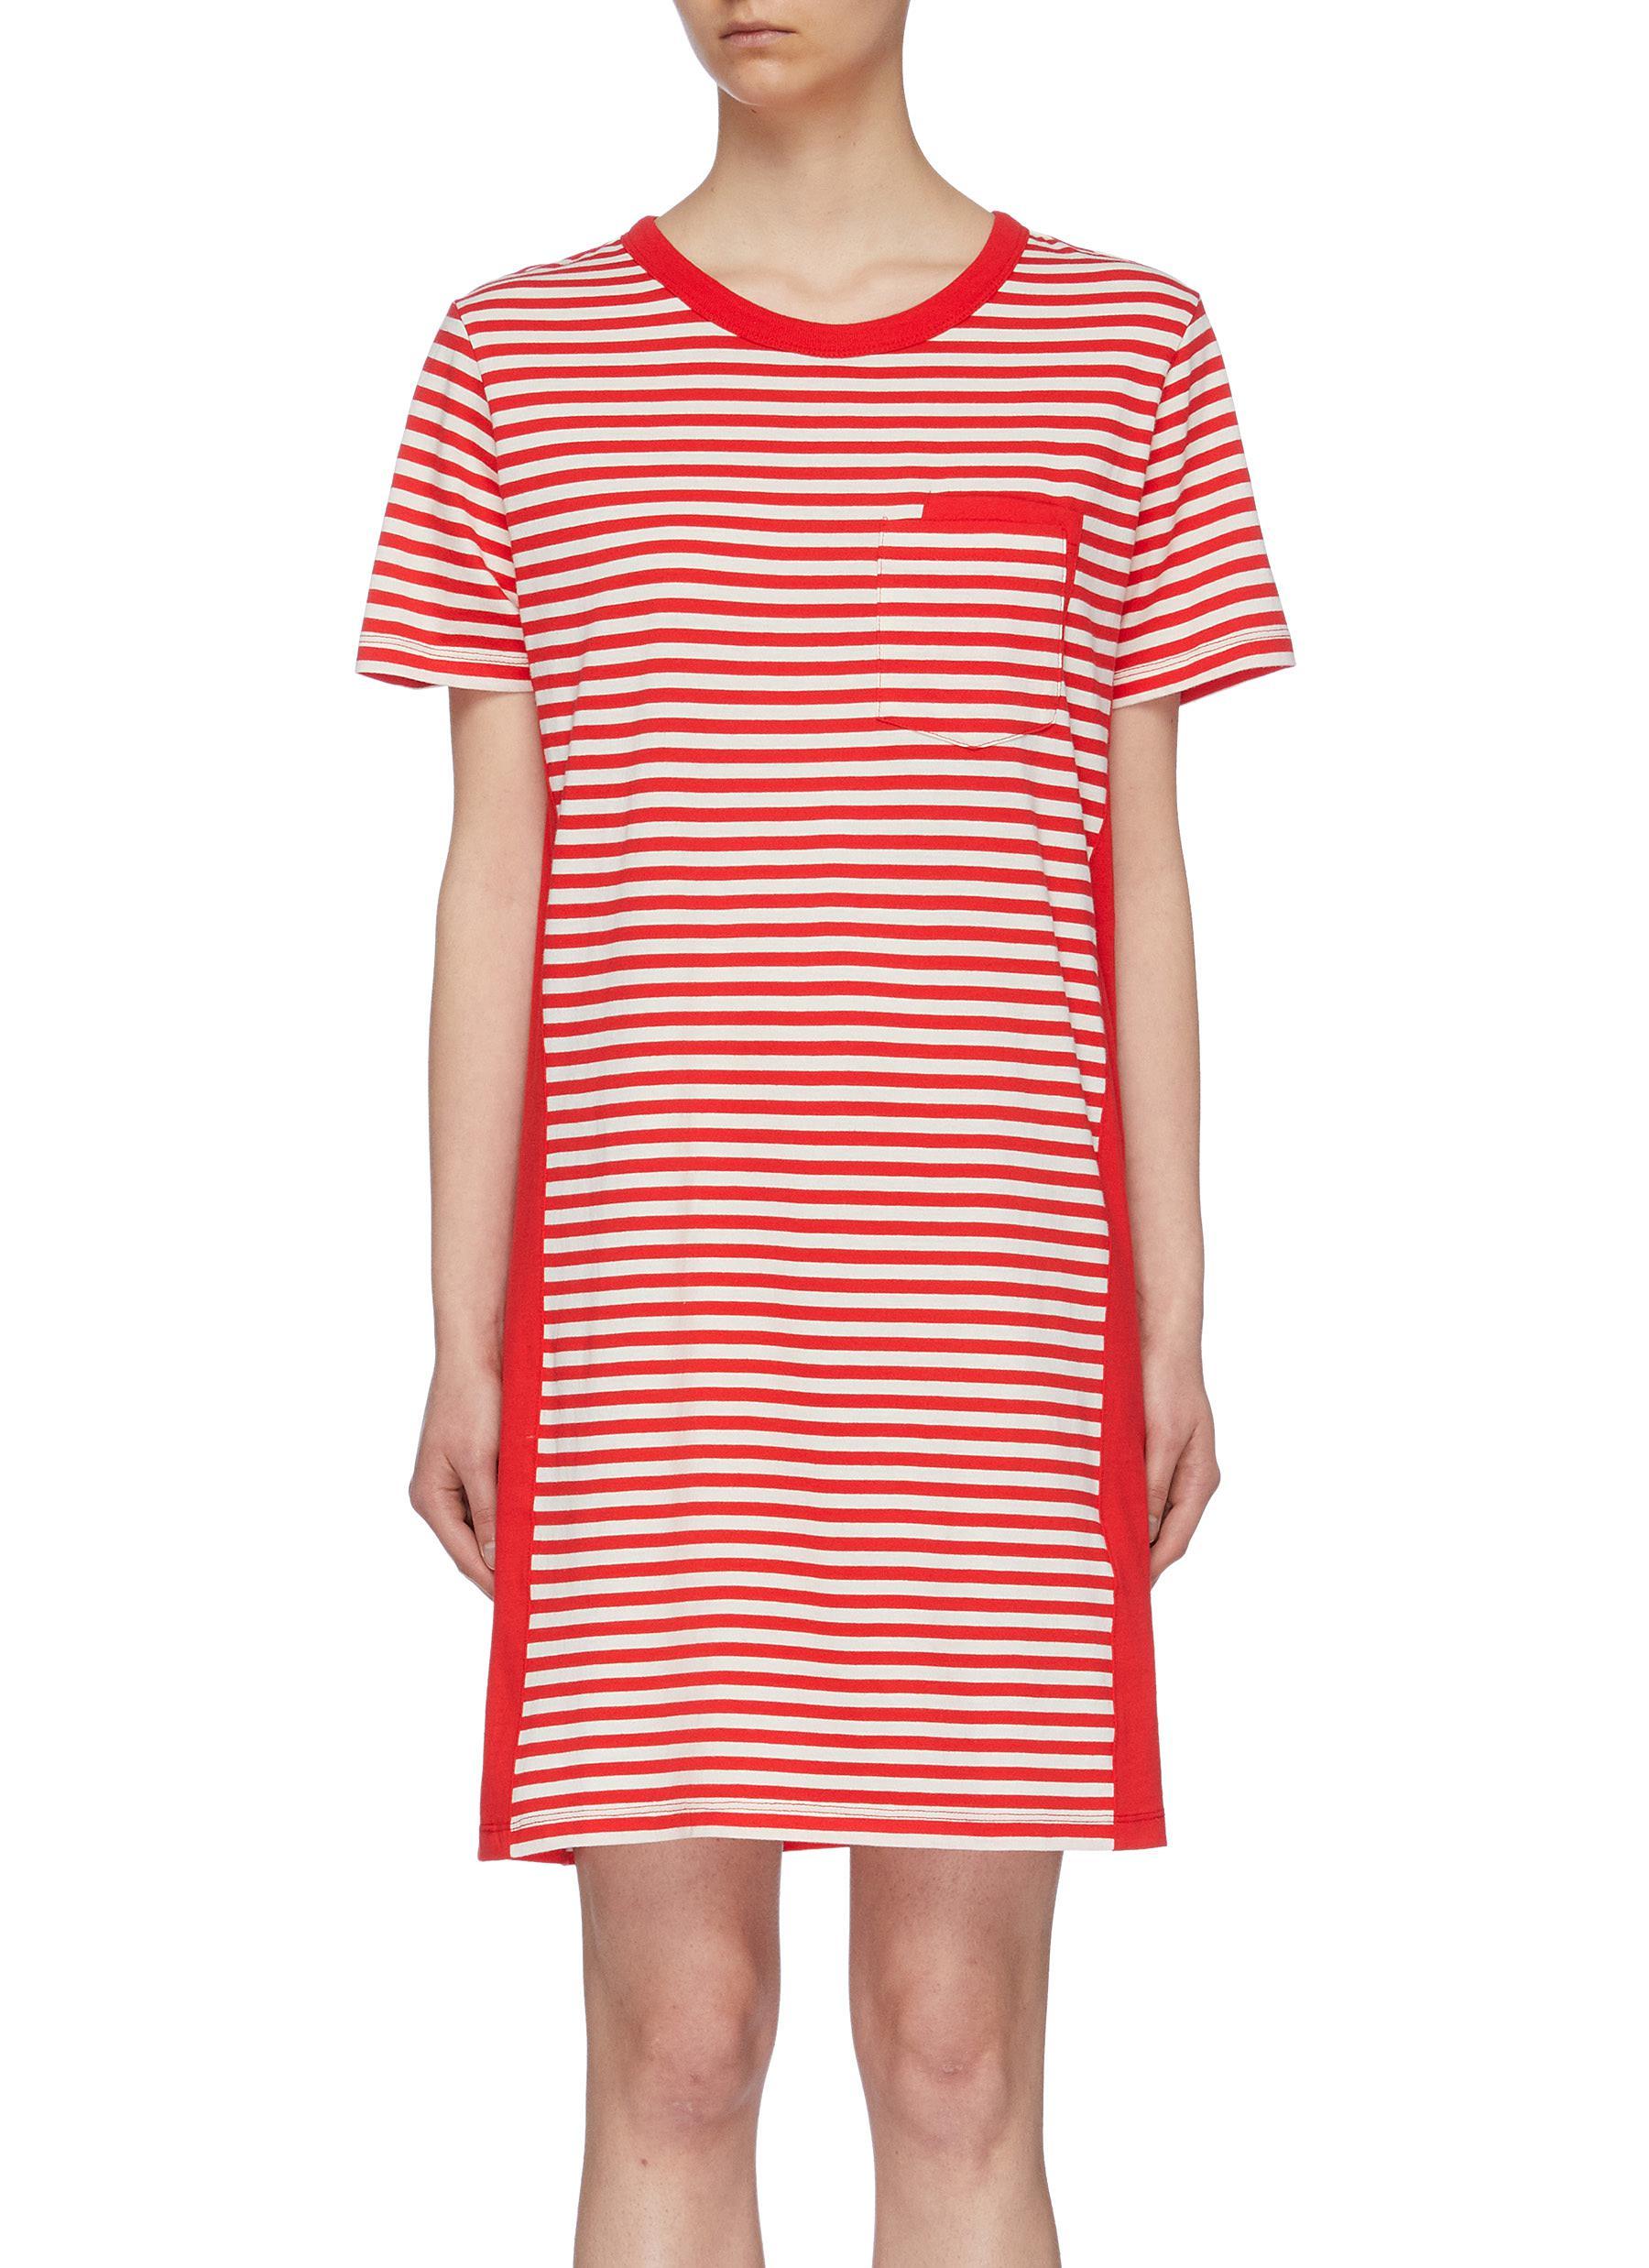 Beatnik colourblock panel stripe T-shirt dress by Current/Elliott